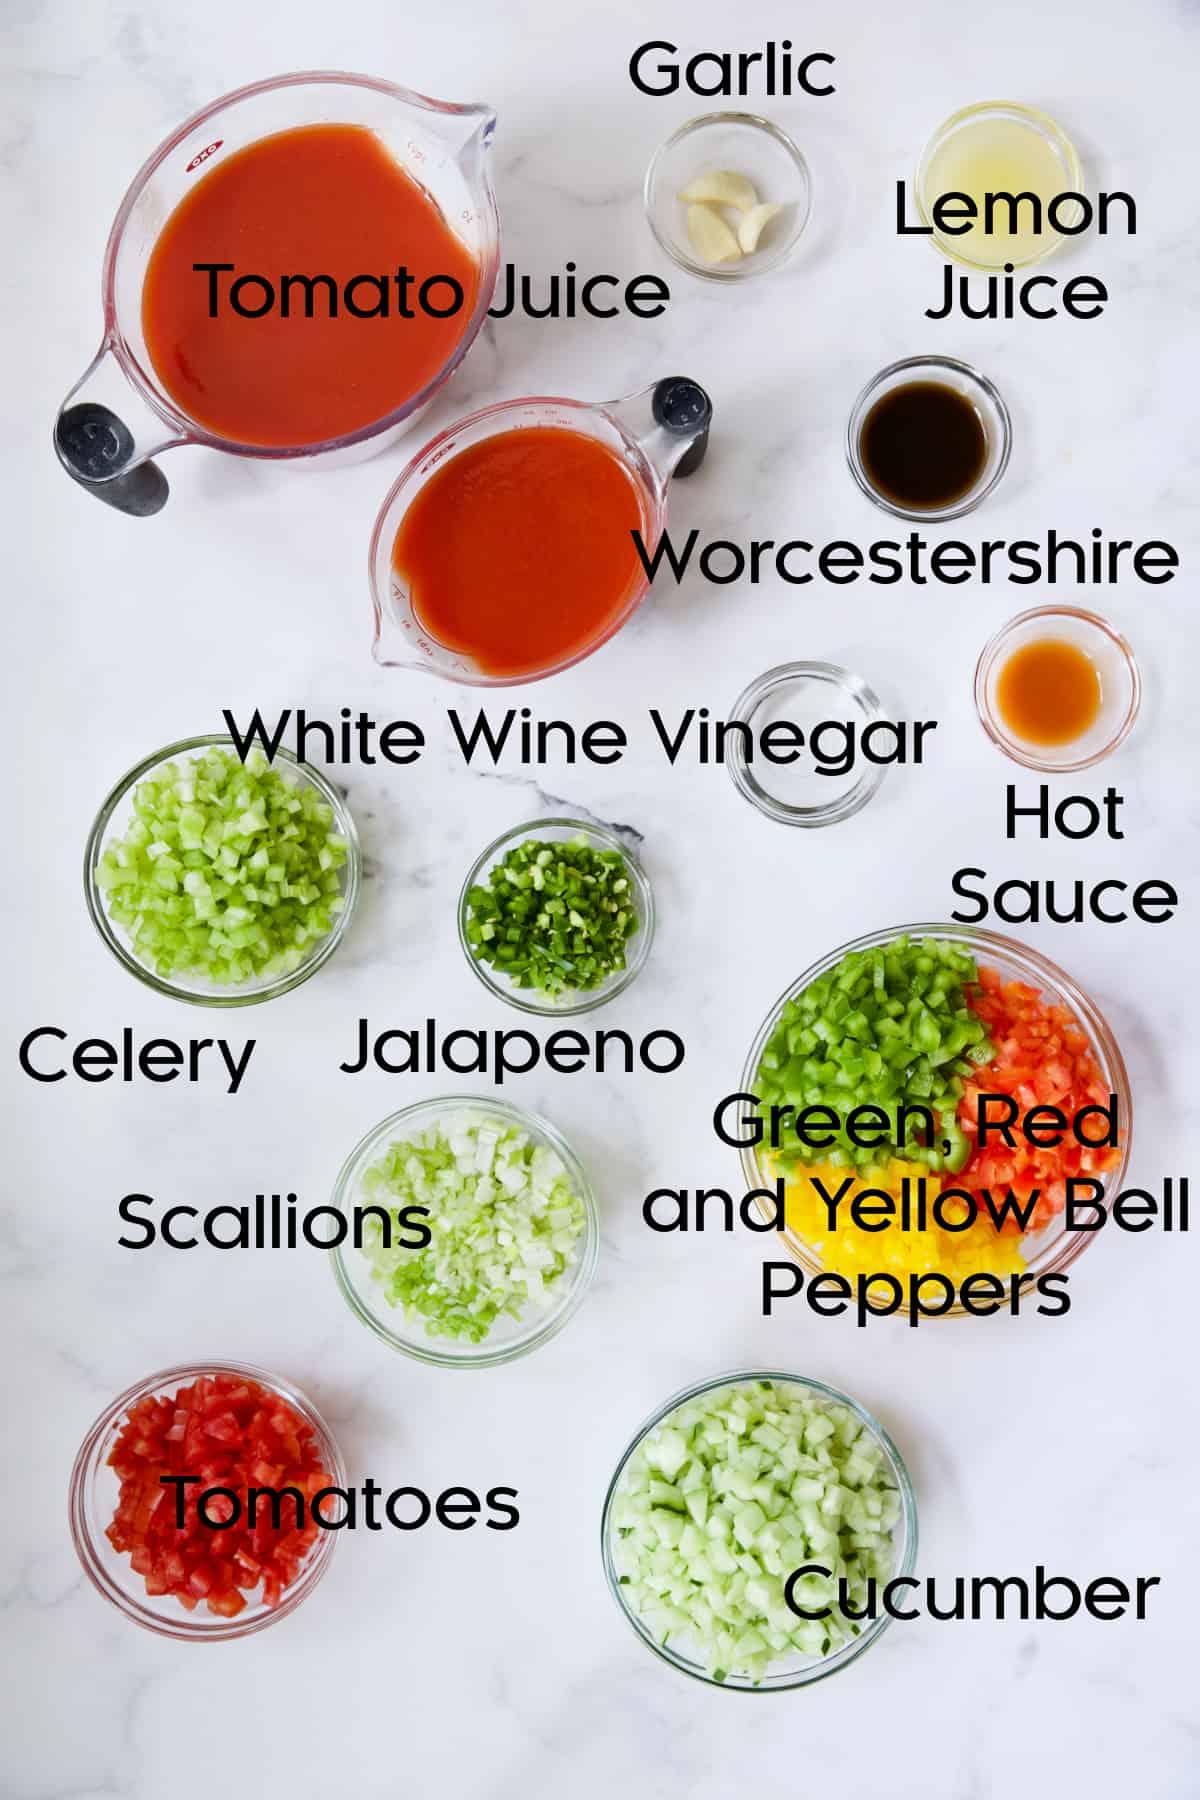 Ingredients for Very Veggie Gazpacho in glass bowls.